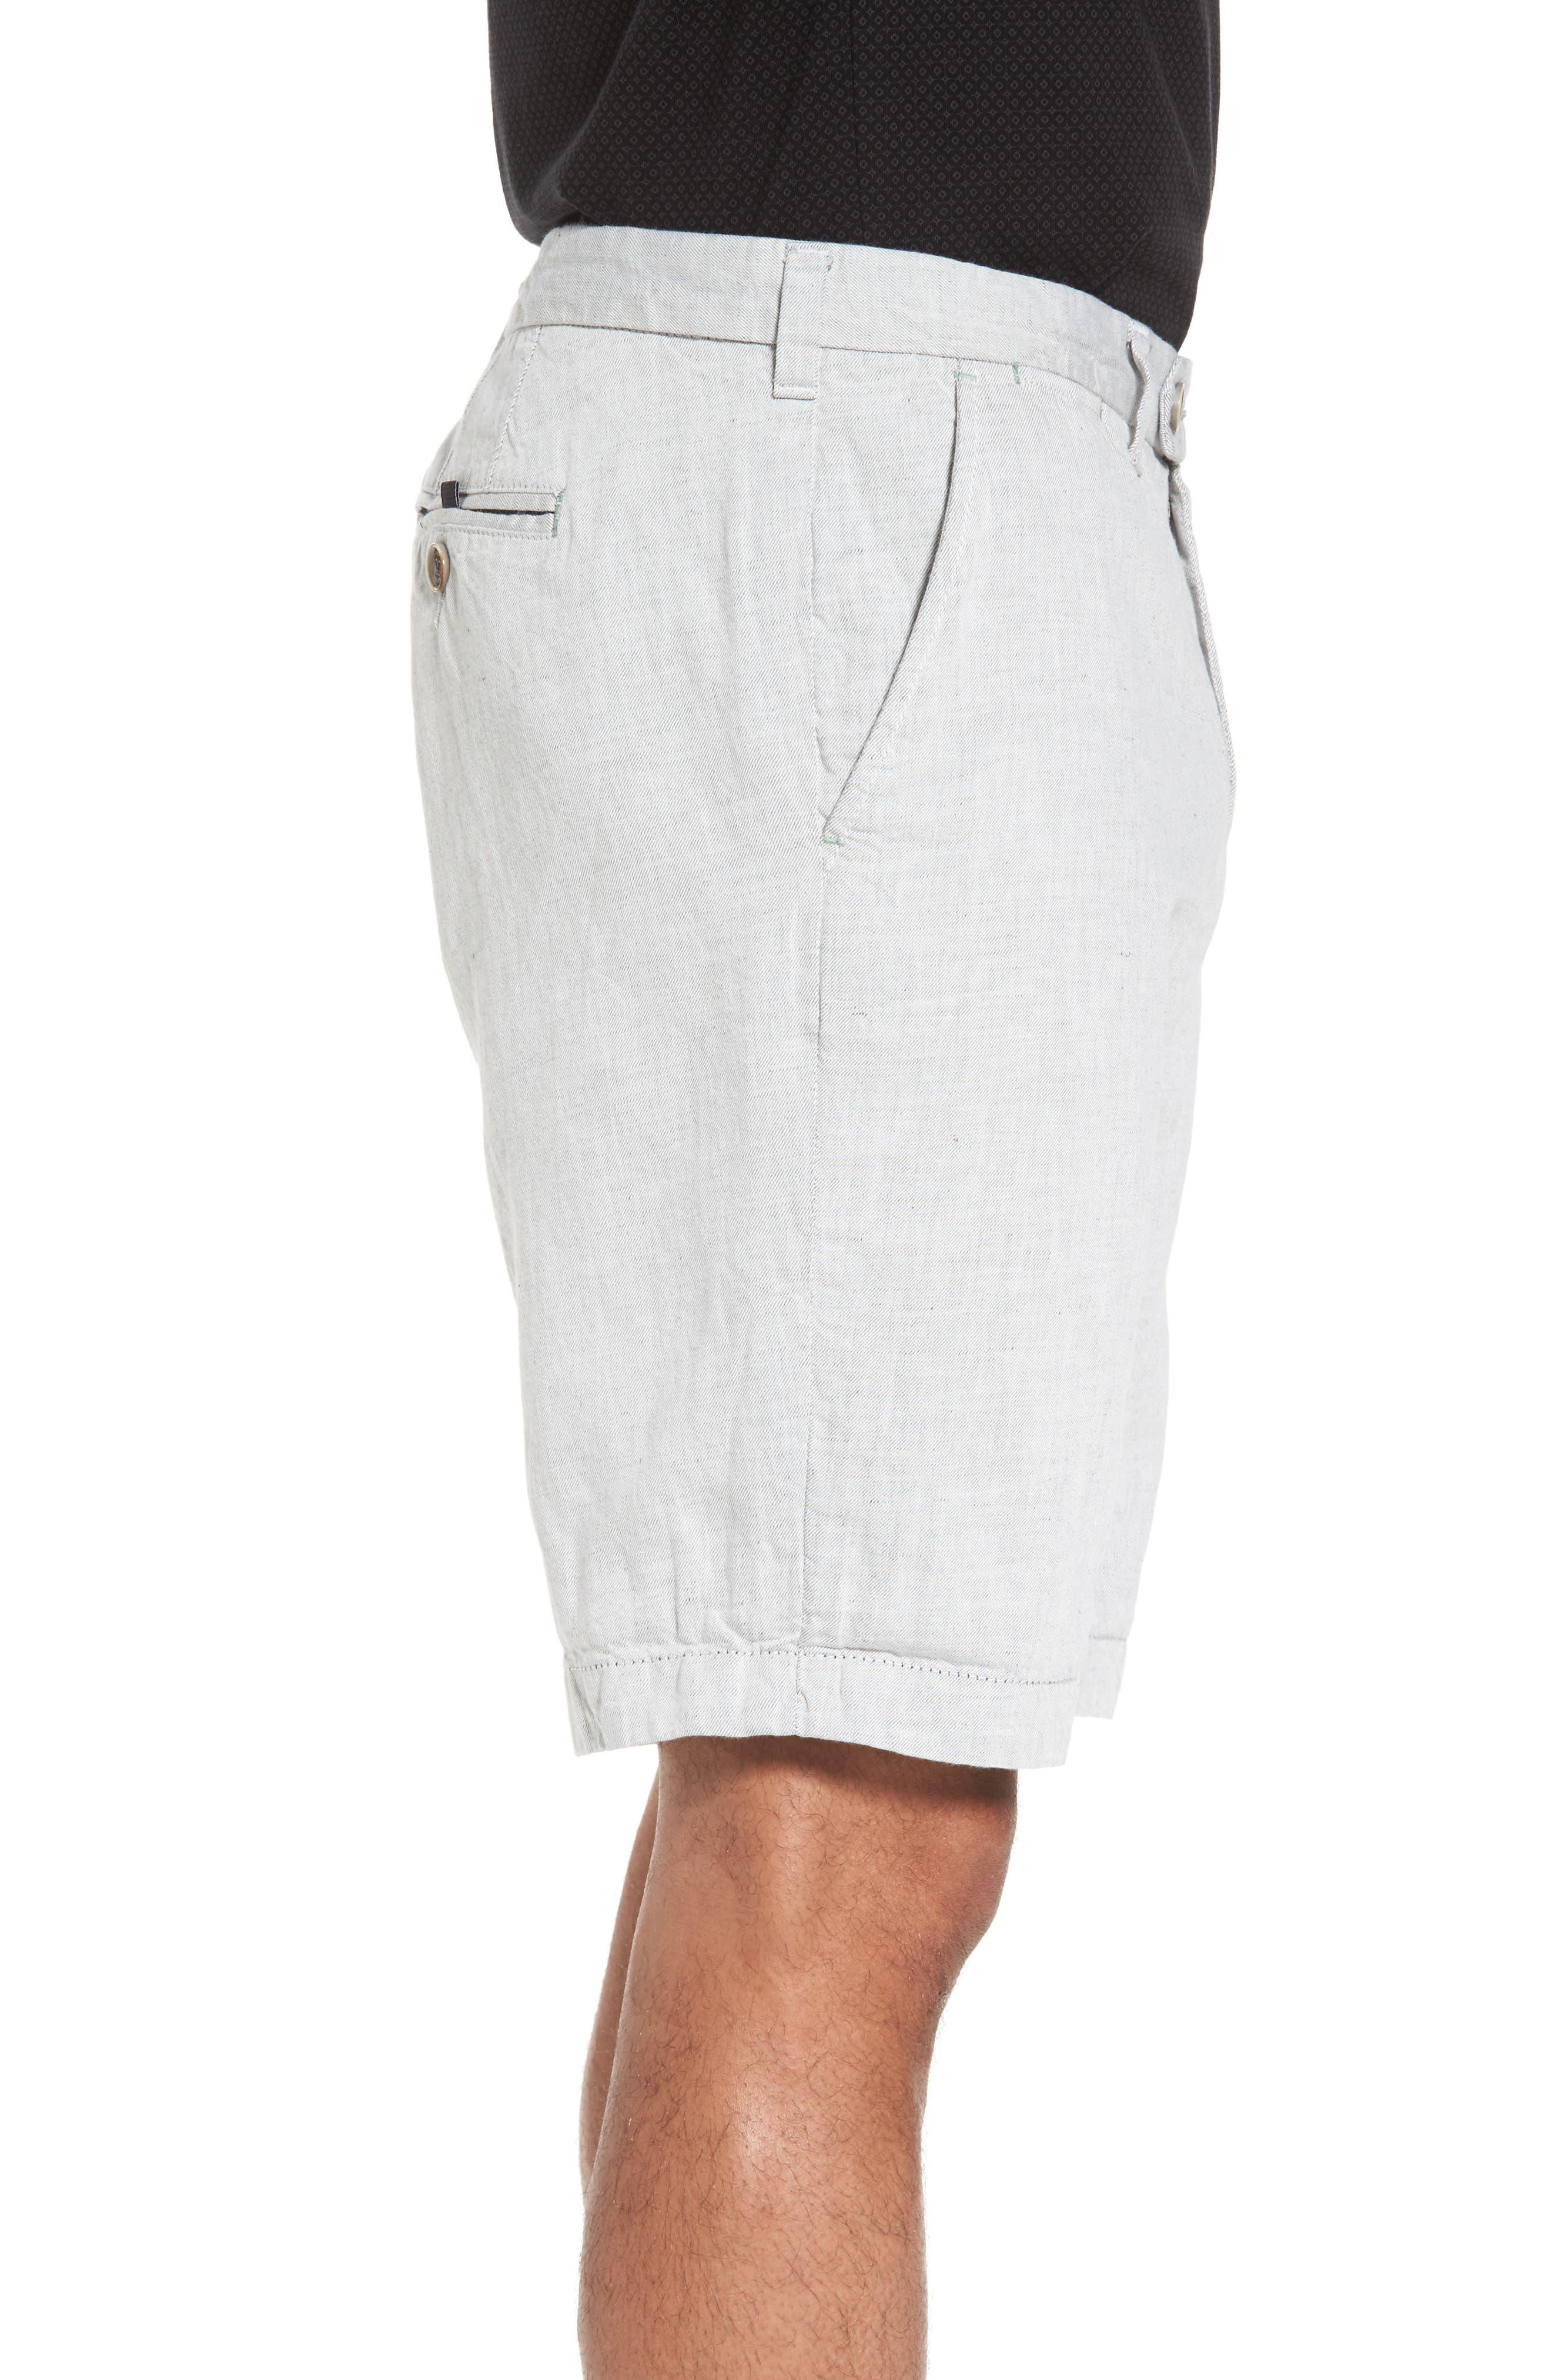 Frisho Cuff Denim Shorts,                             Alternate thumbnail 5, color,